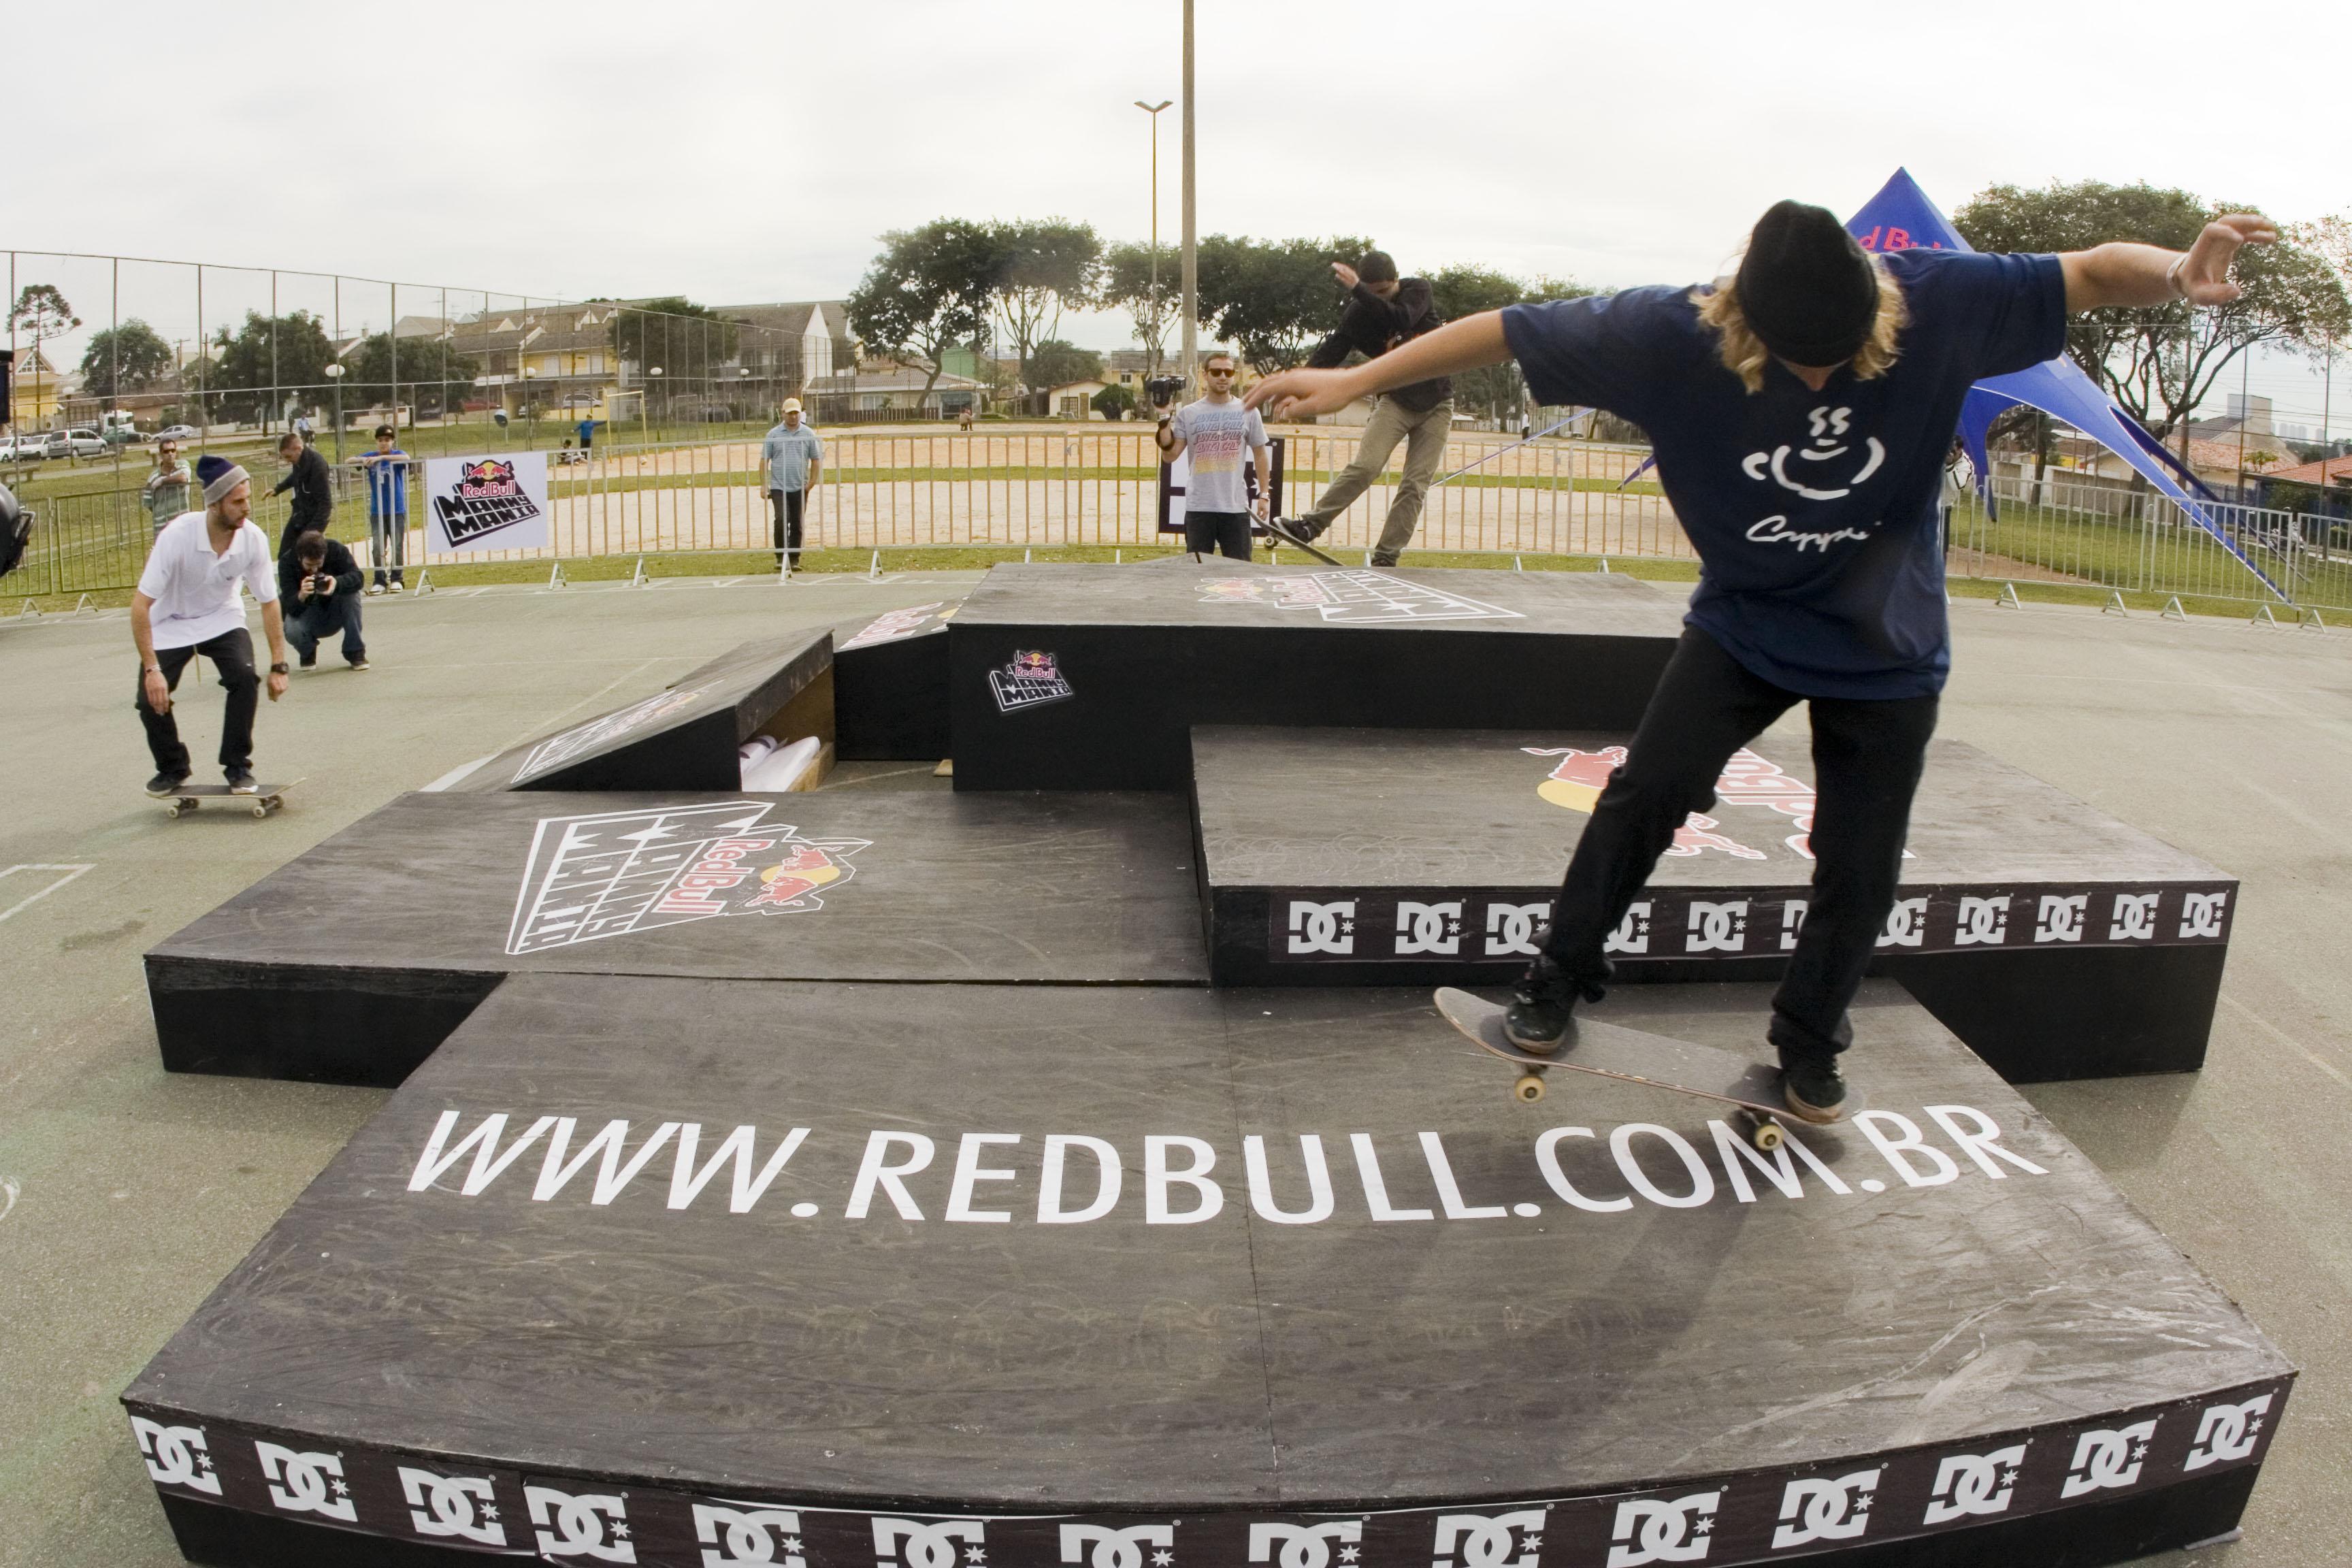 Red Bull Many Mania cwb 2012